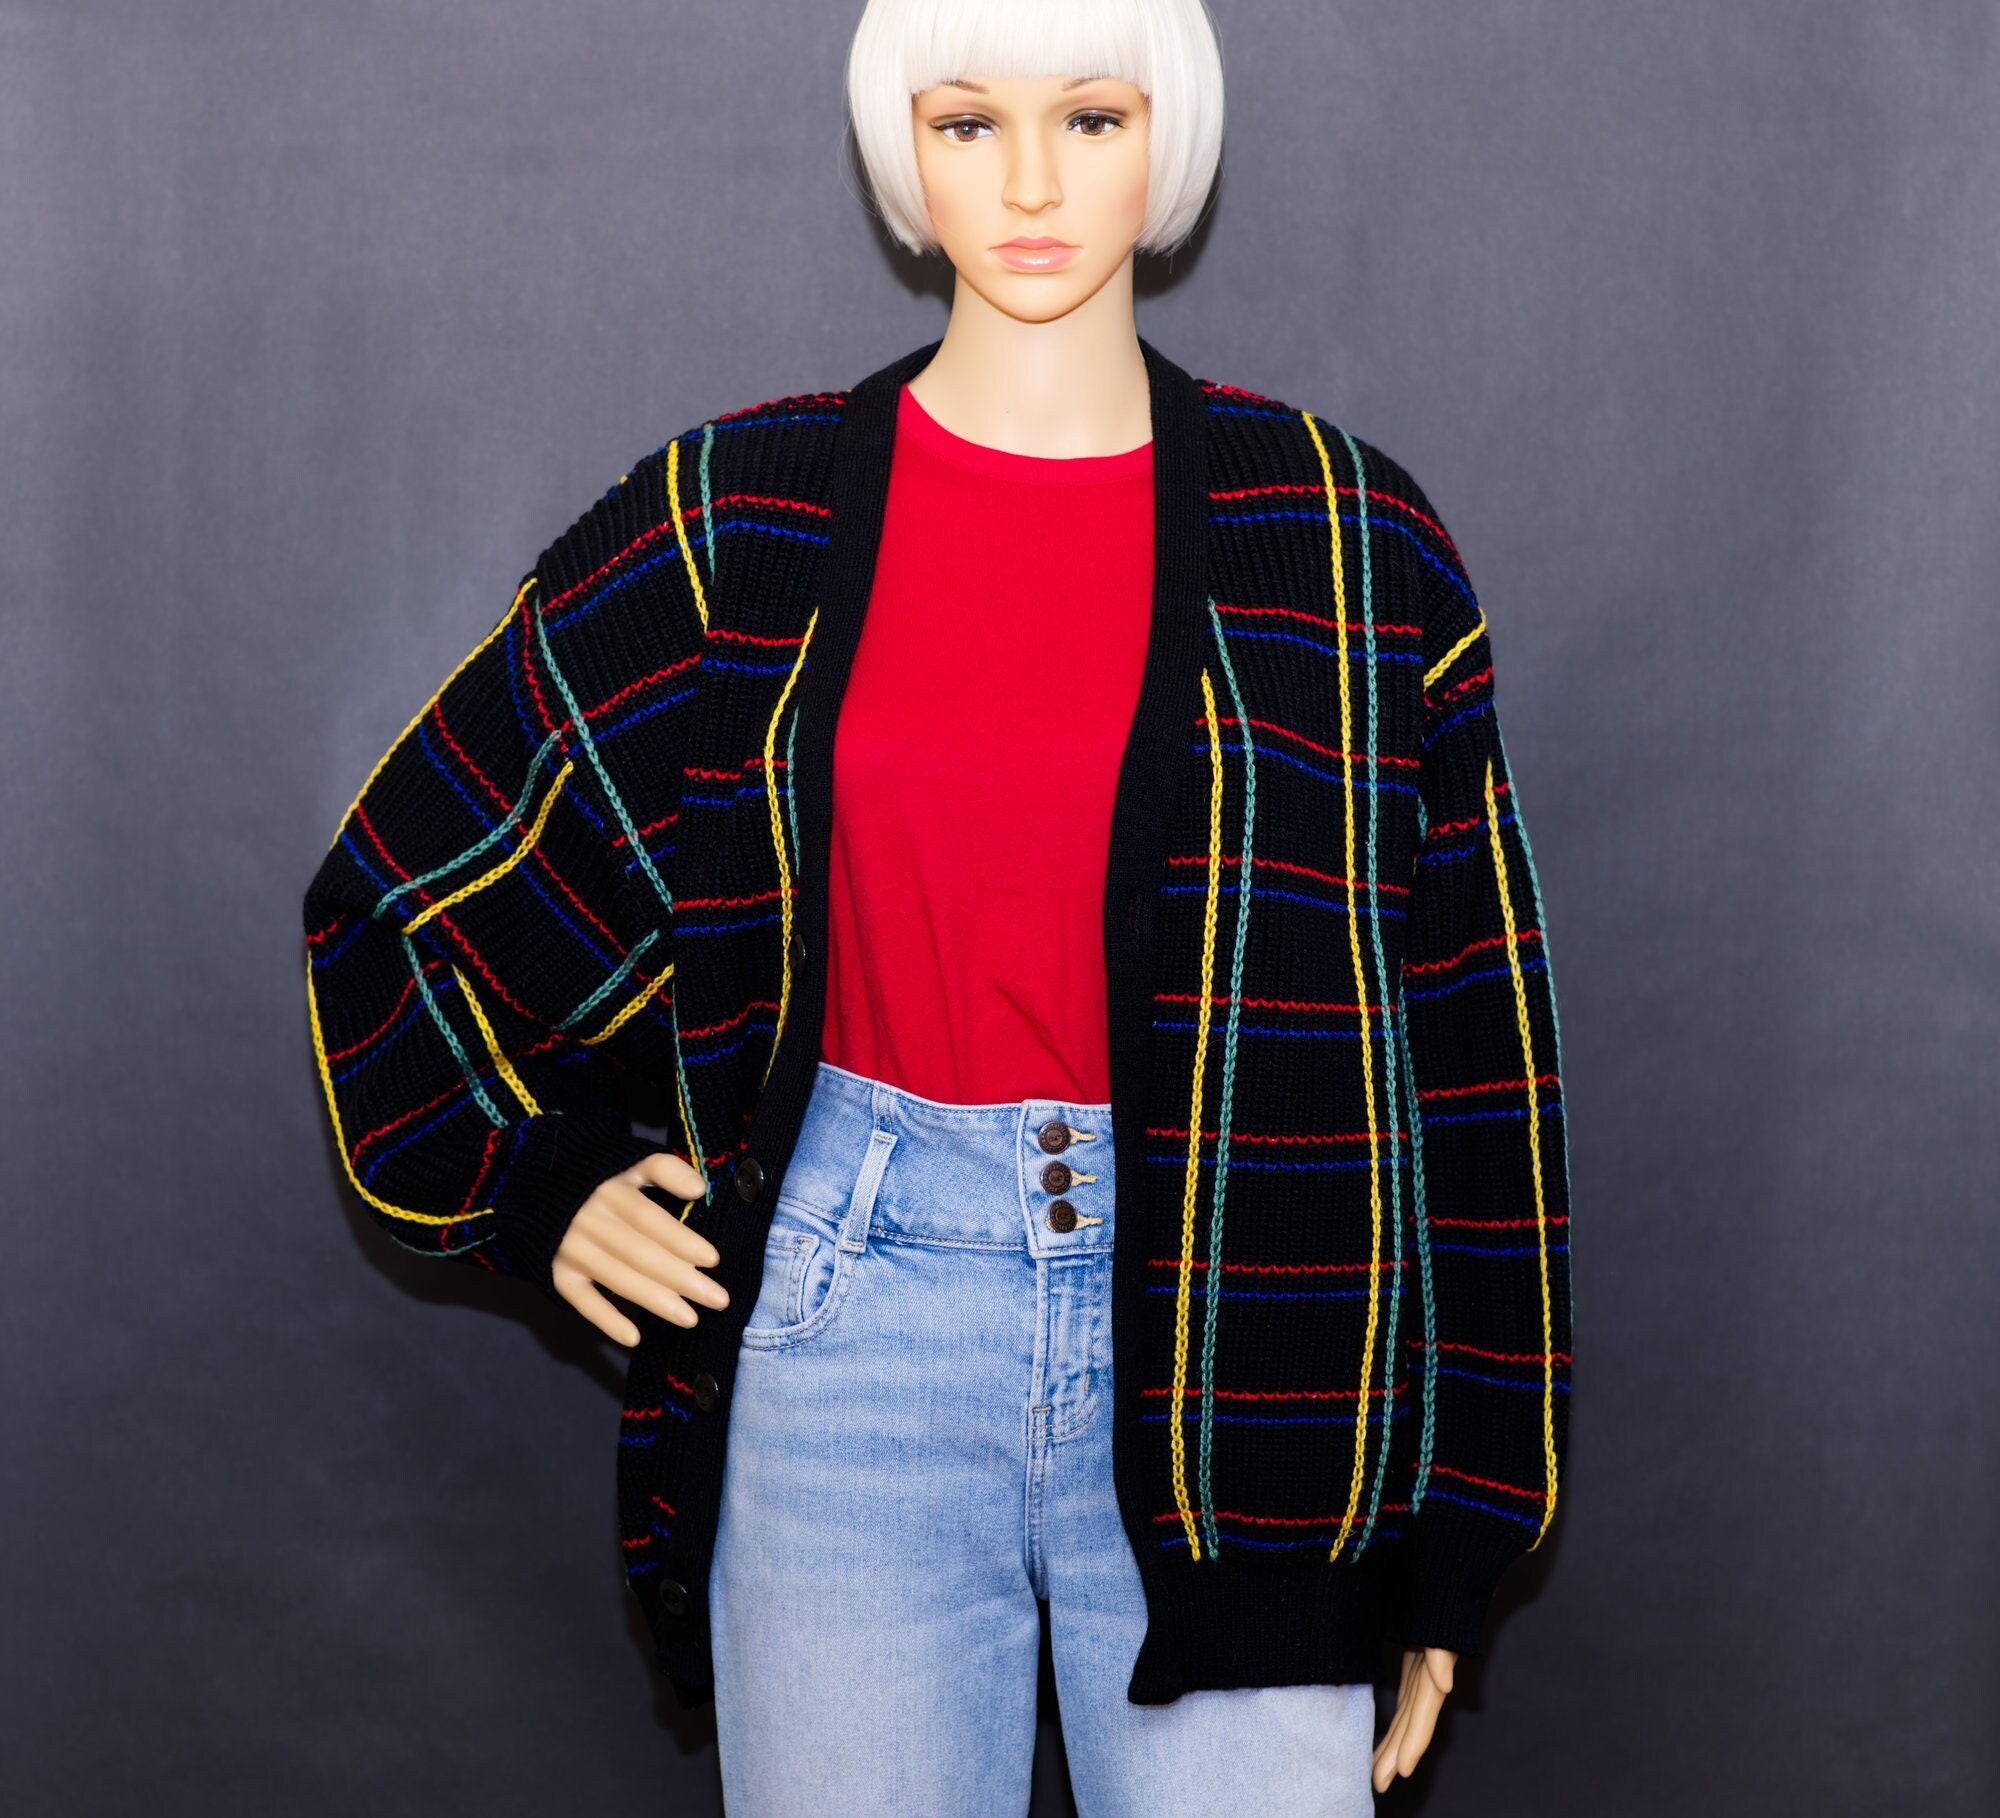 80s Sweatshirts, Sweaters, Vests | Women Vintage 1980S Colorful Stitched Black Cardigan Sweater  Xl $54.00 AT vintagedancer.com